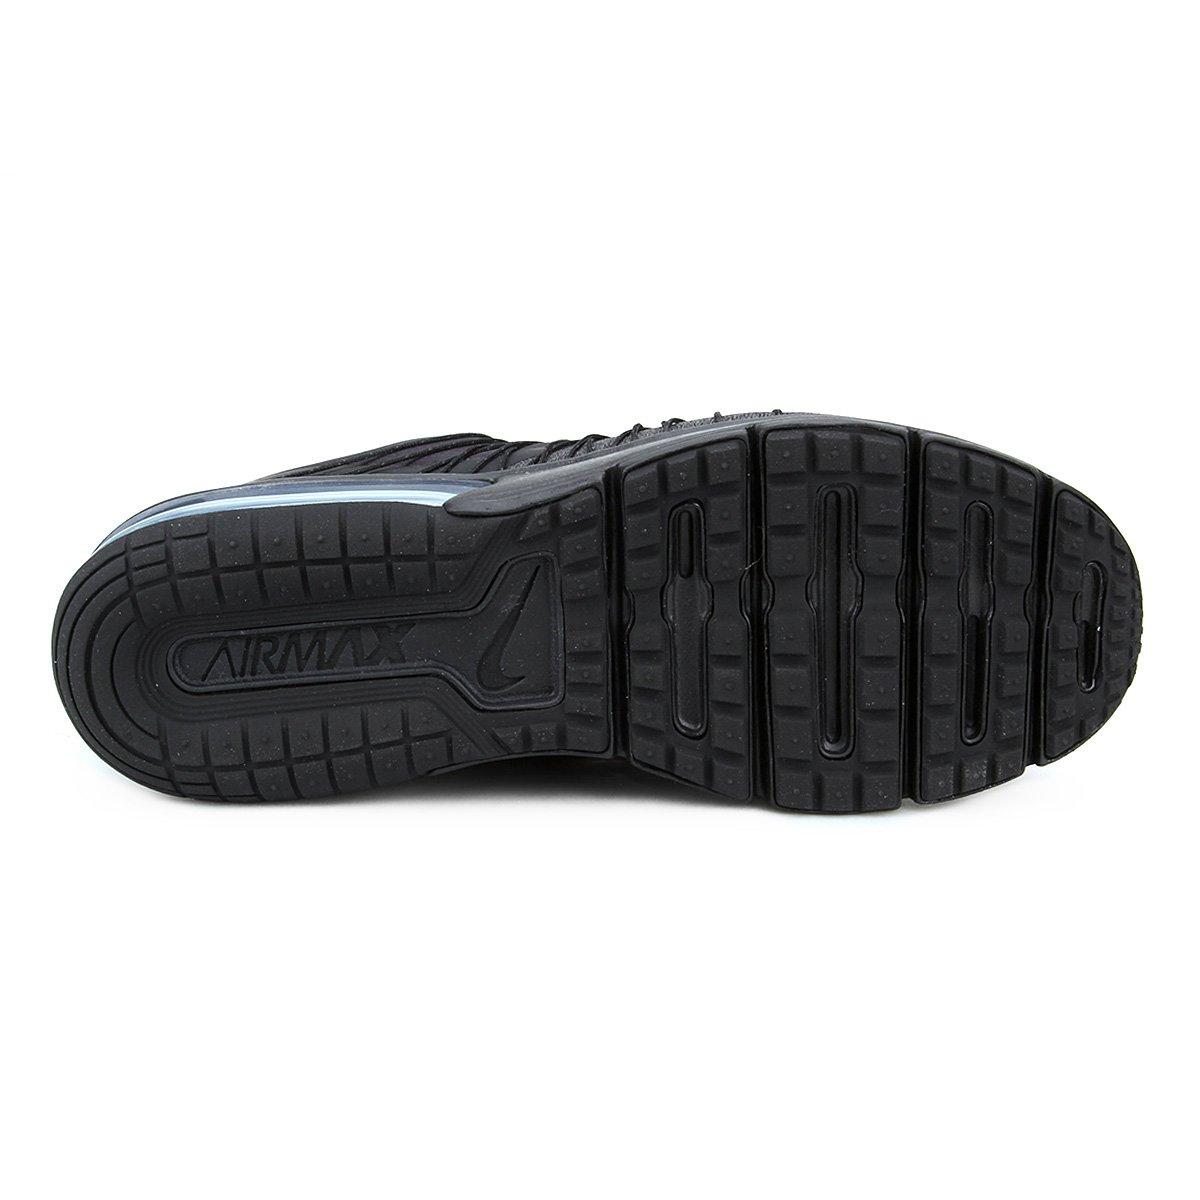 Tênis Nike Air Max Sequent 4 Utility Masculino - 3